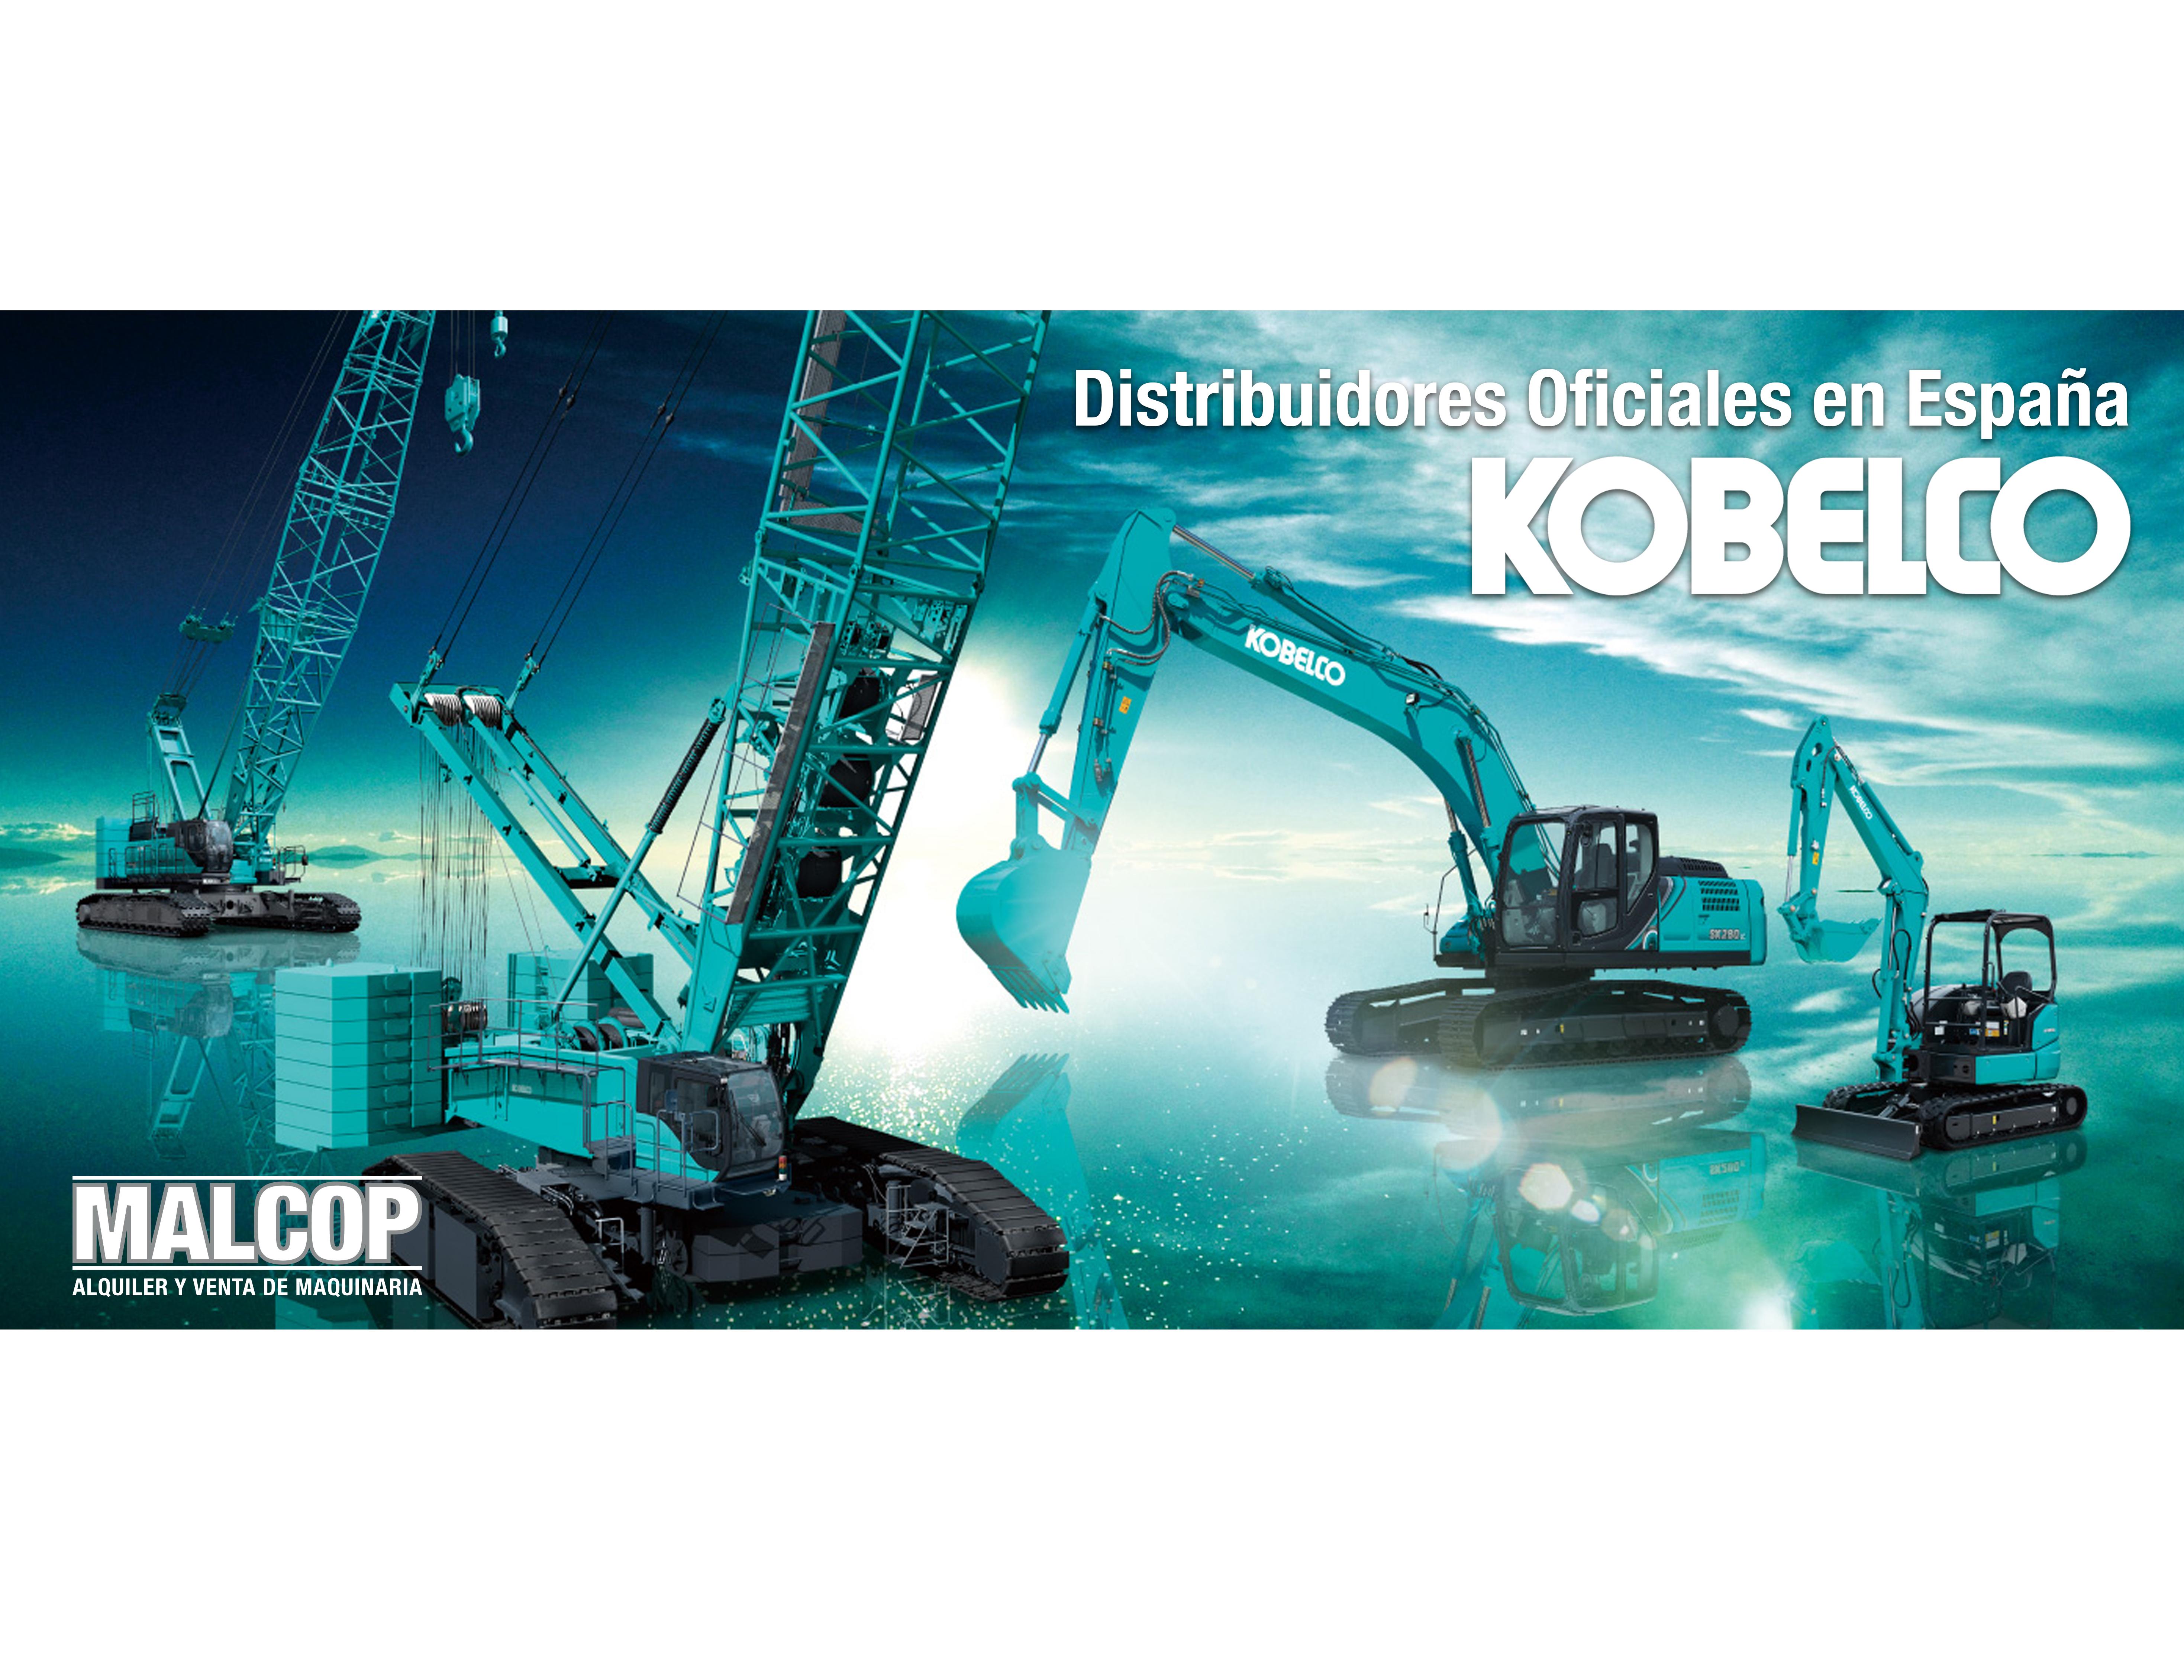 Kobelco-Malcop